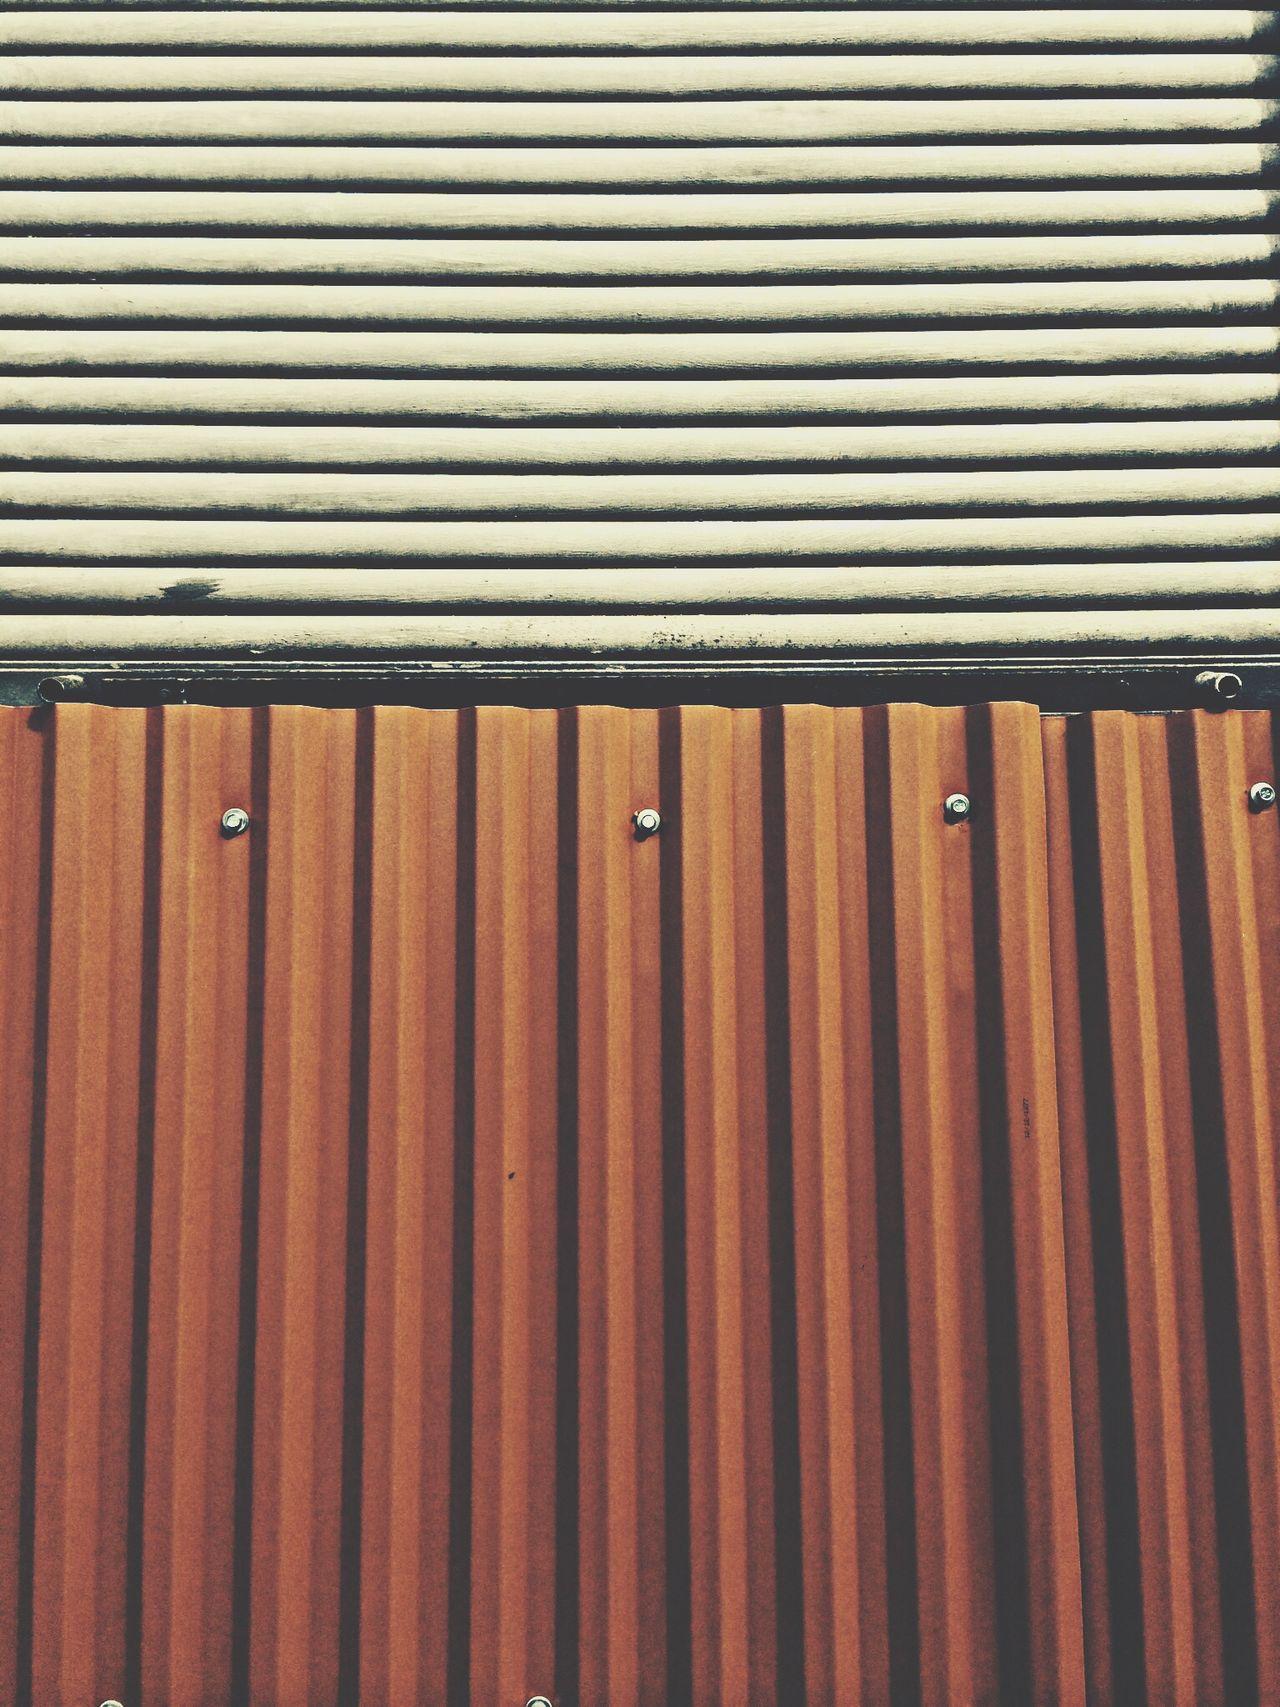 Beautiful stock photos of metal, Aluminum Sheet, Backgrounds, Corrugated Iron, Full Frame